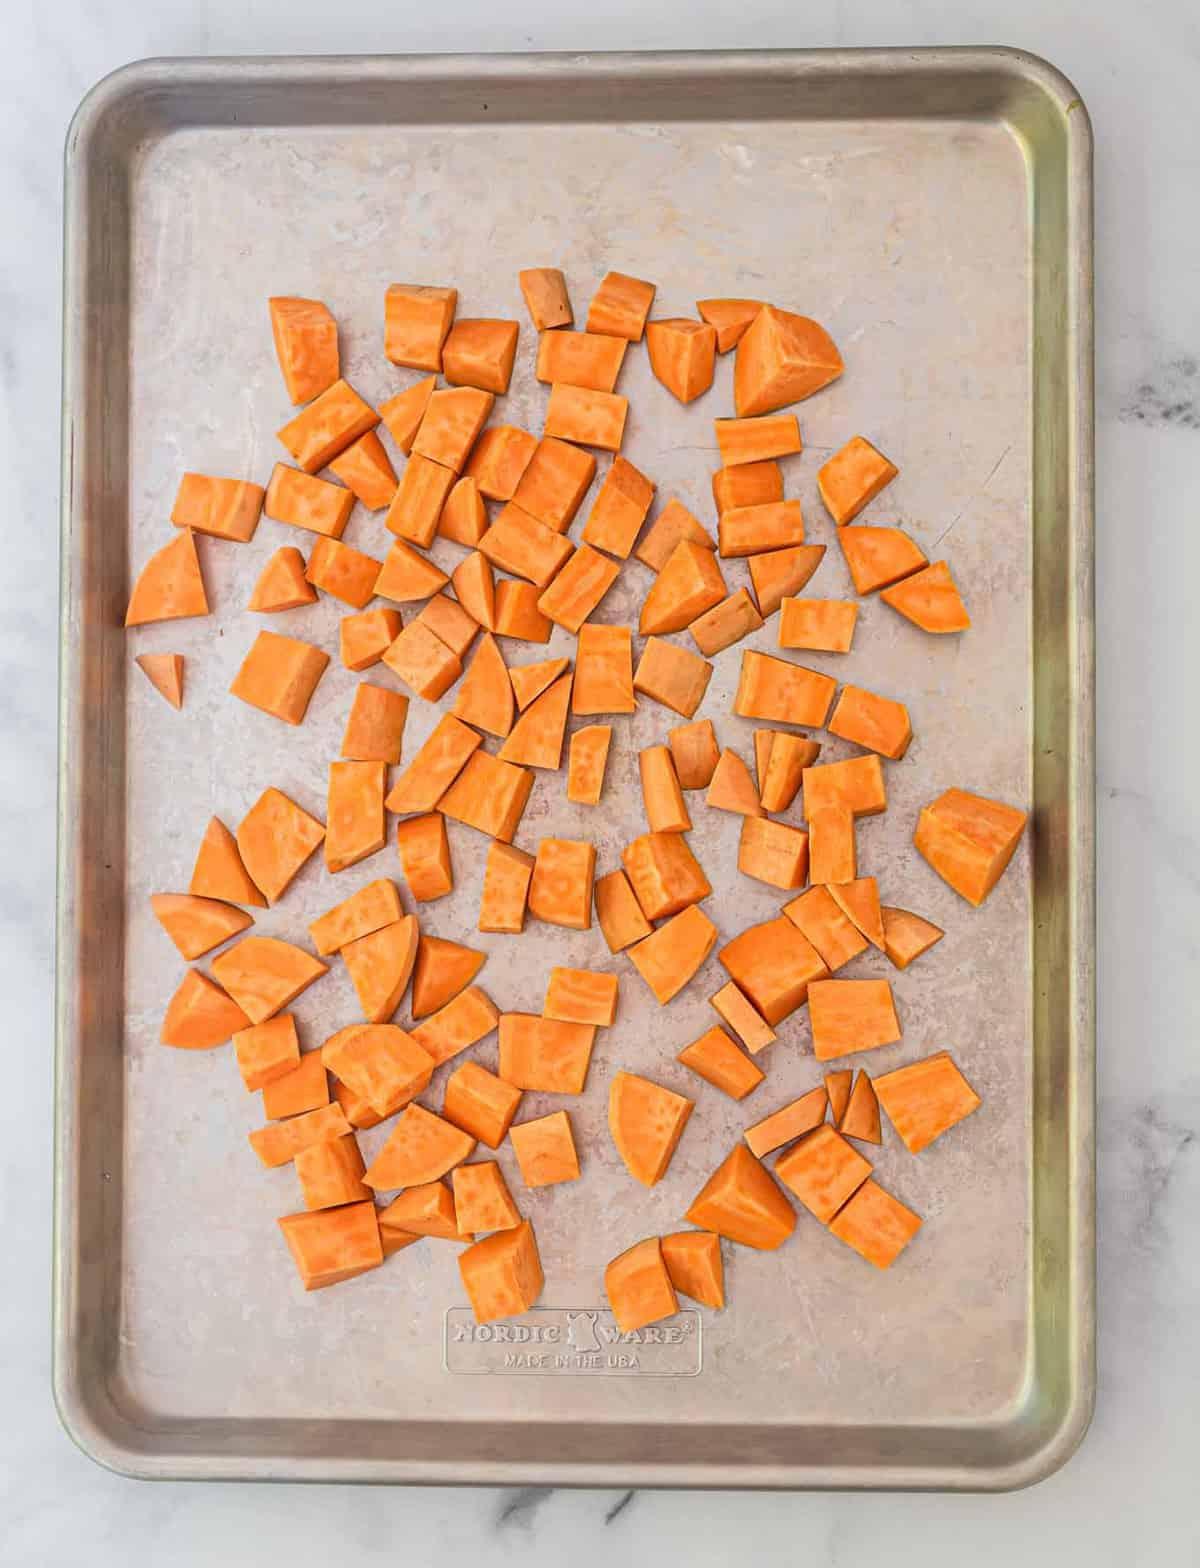 diced raw sweet potatoes on a baking sheet